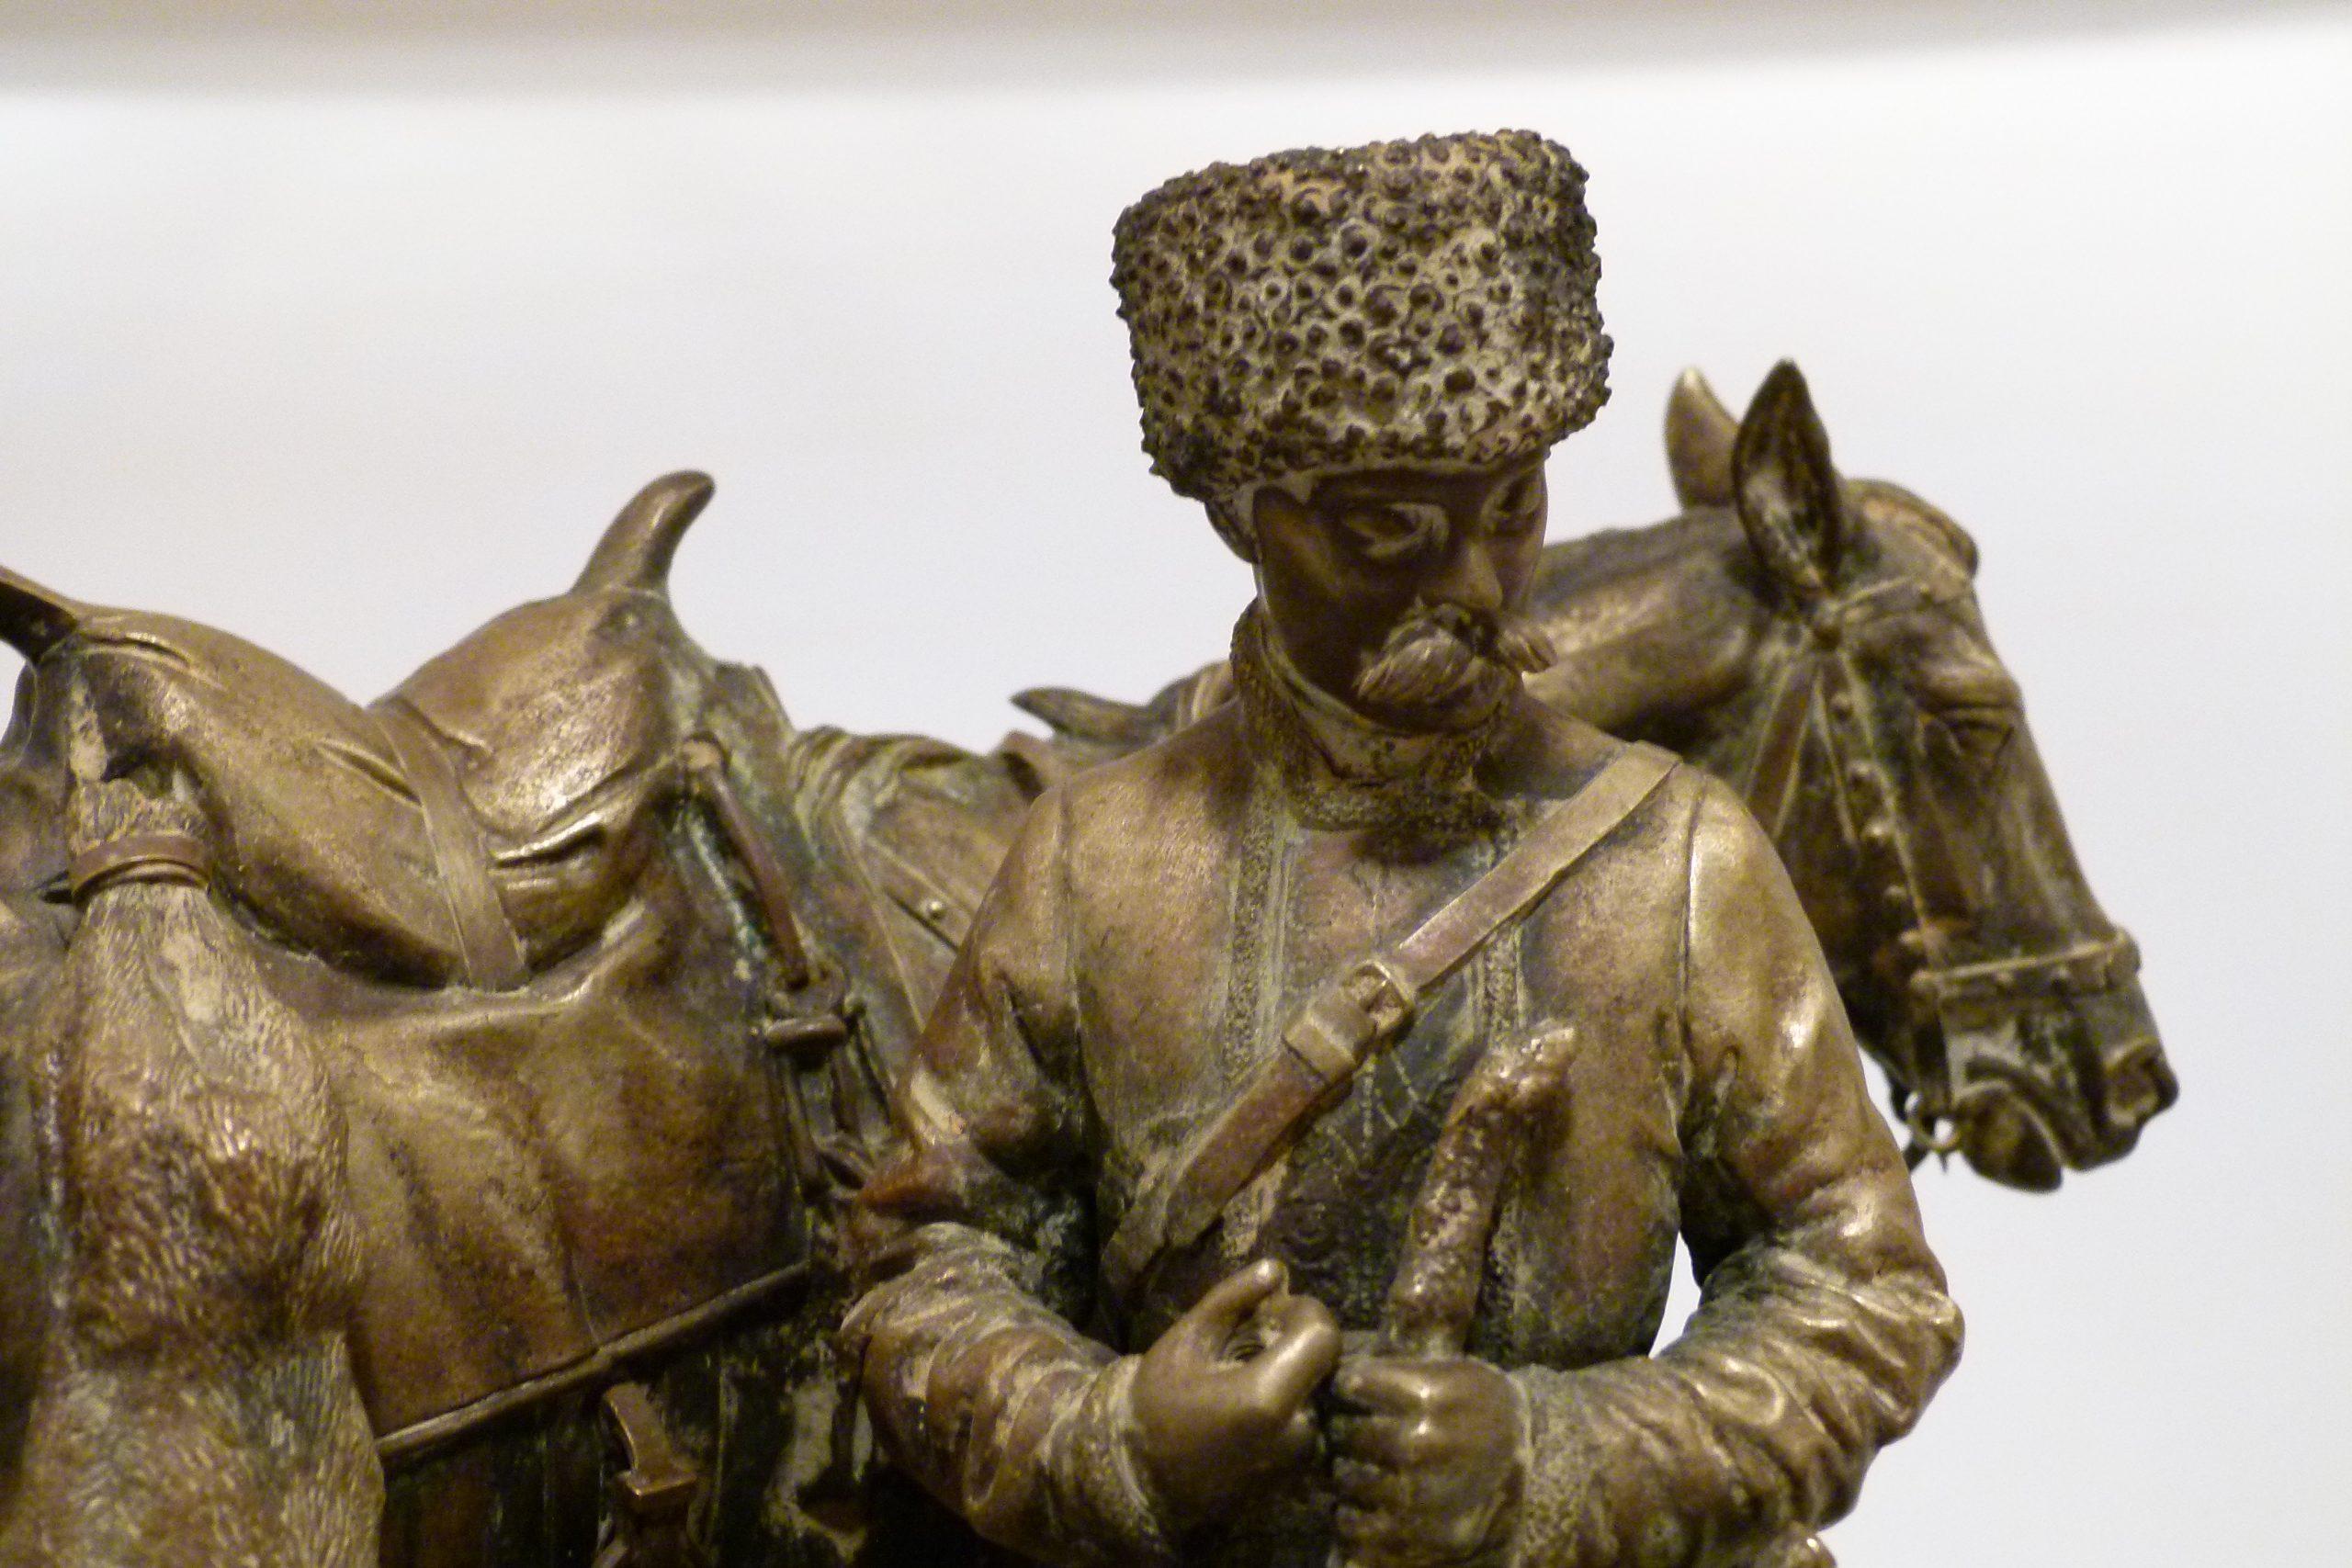 nikolay-ivanovivh-leiberich - lieberich-hare-hunting-cossack-horse